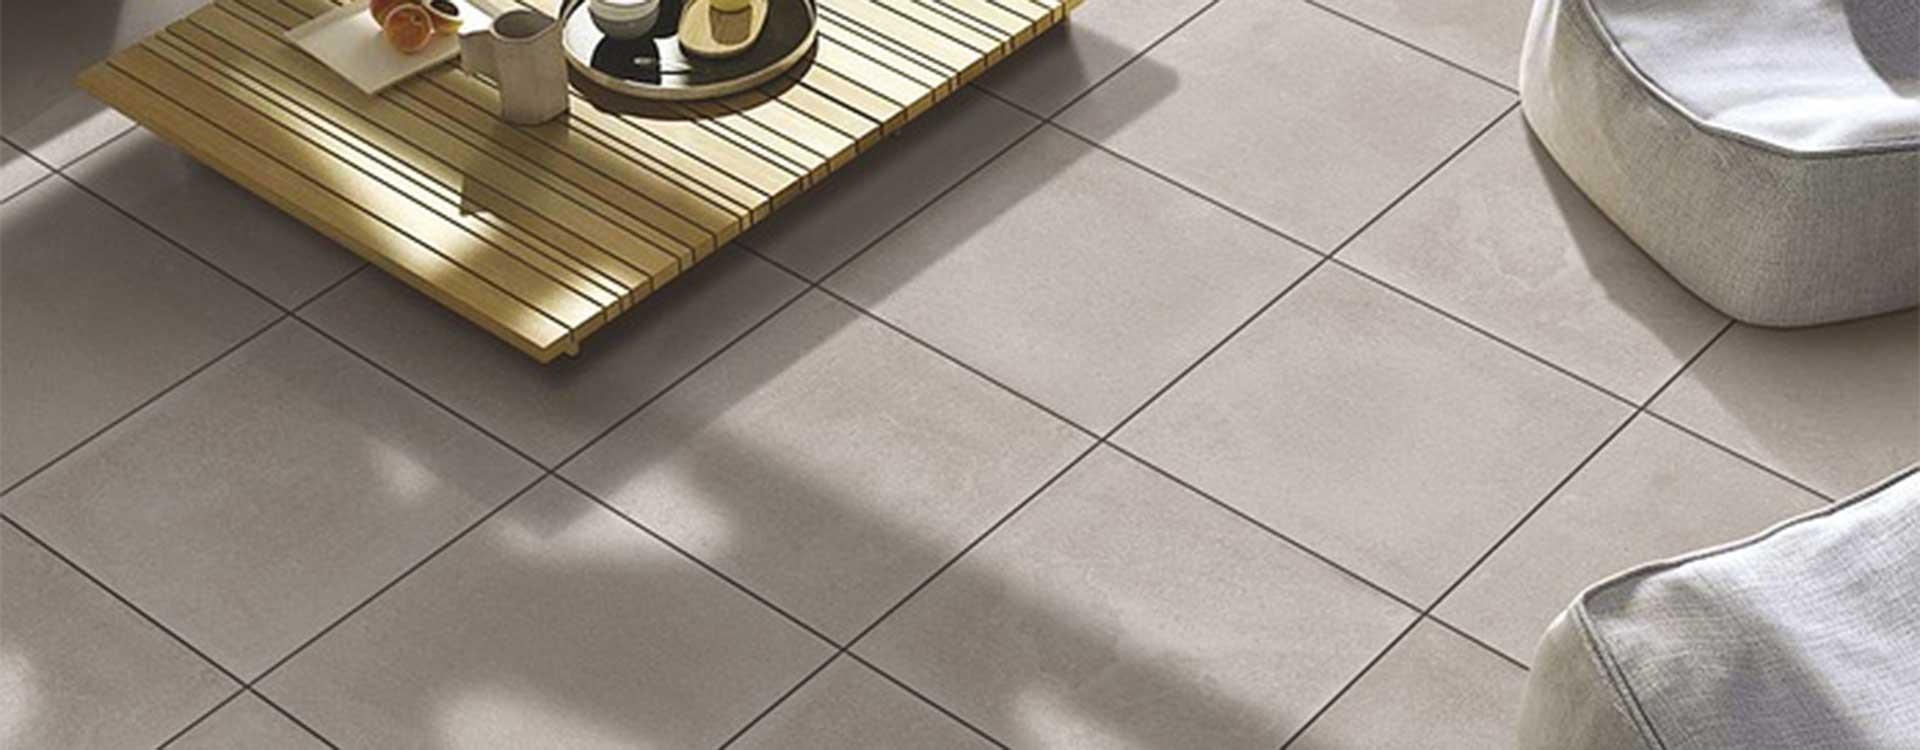 remove grout haze from porcelain tile